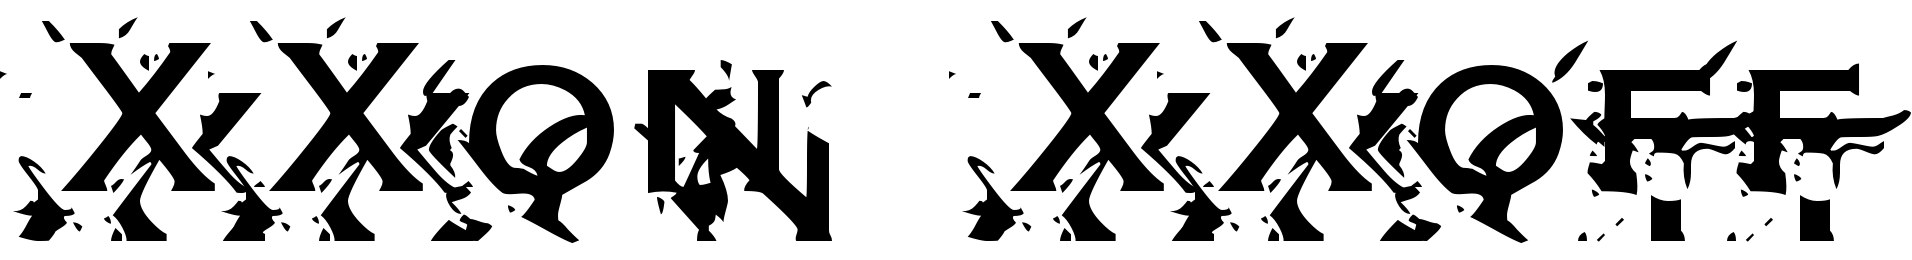 XXon XXoff